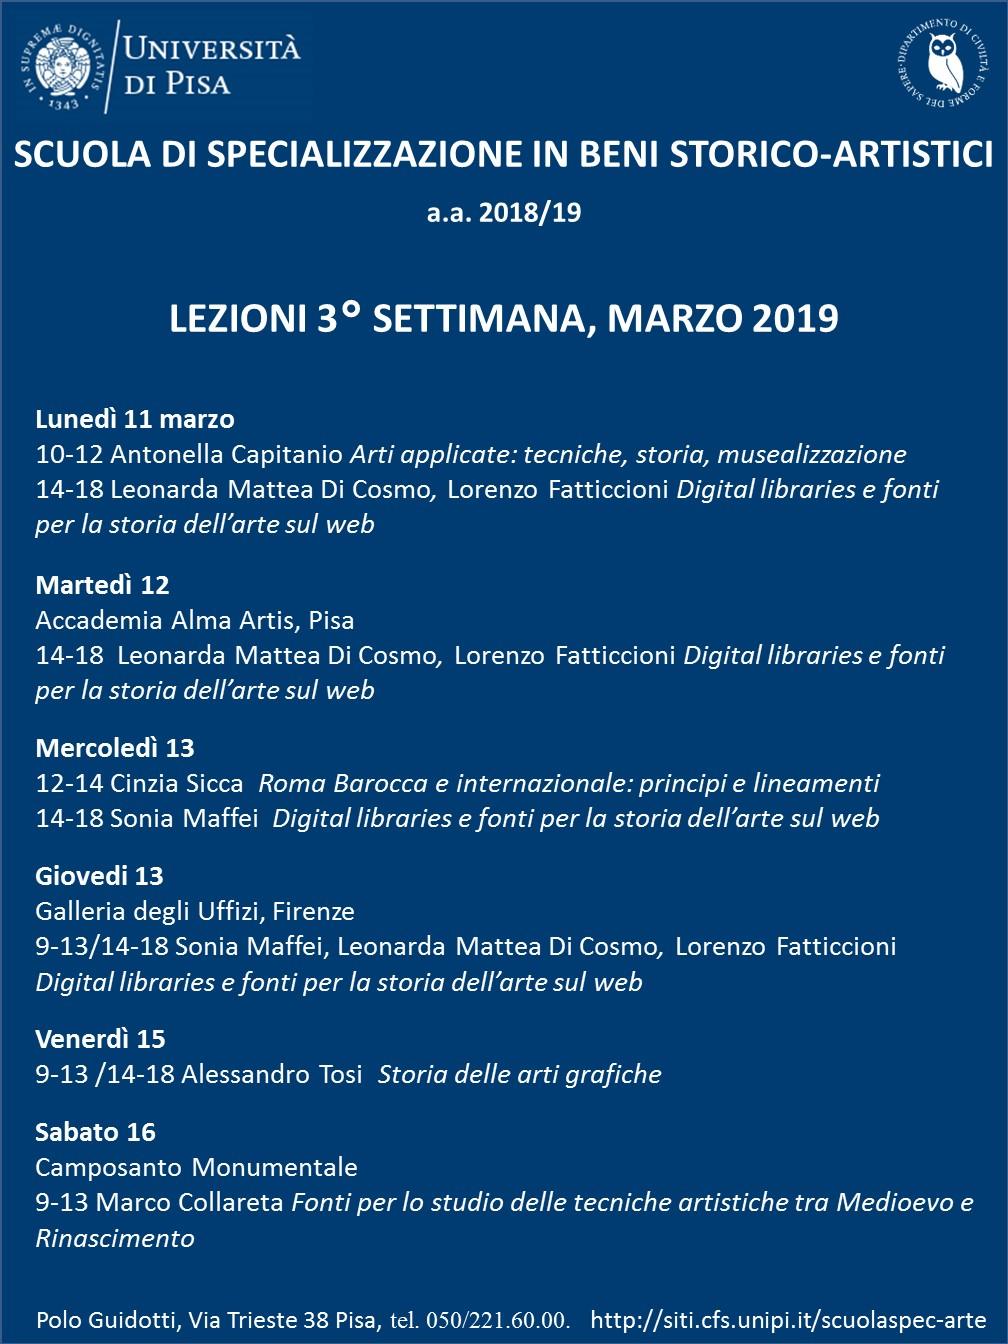 Calendario Lezioni Unipi.Calendario Dei Corsi 2018 2019